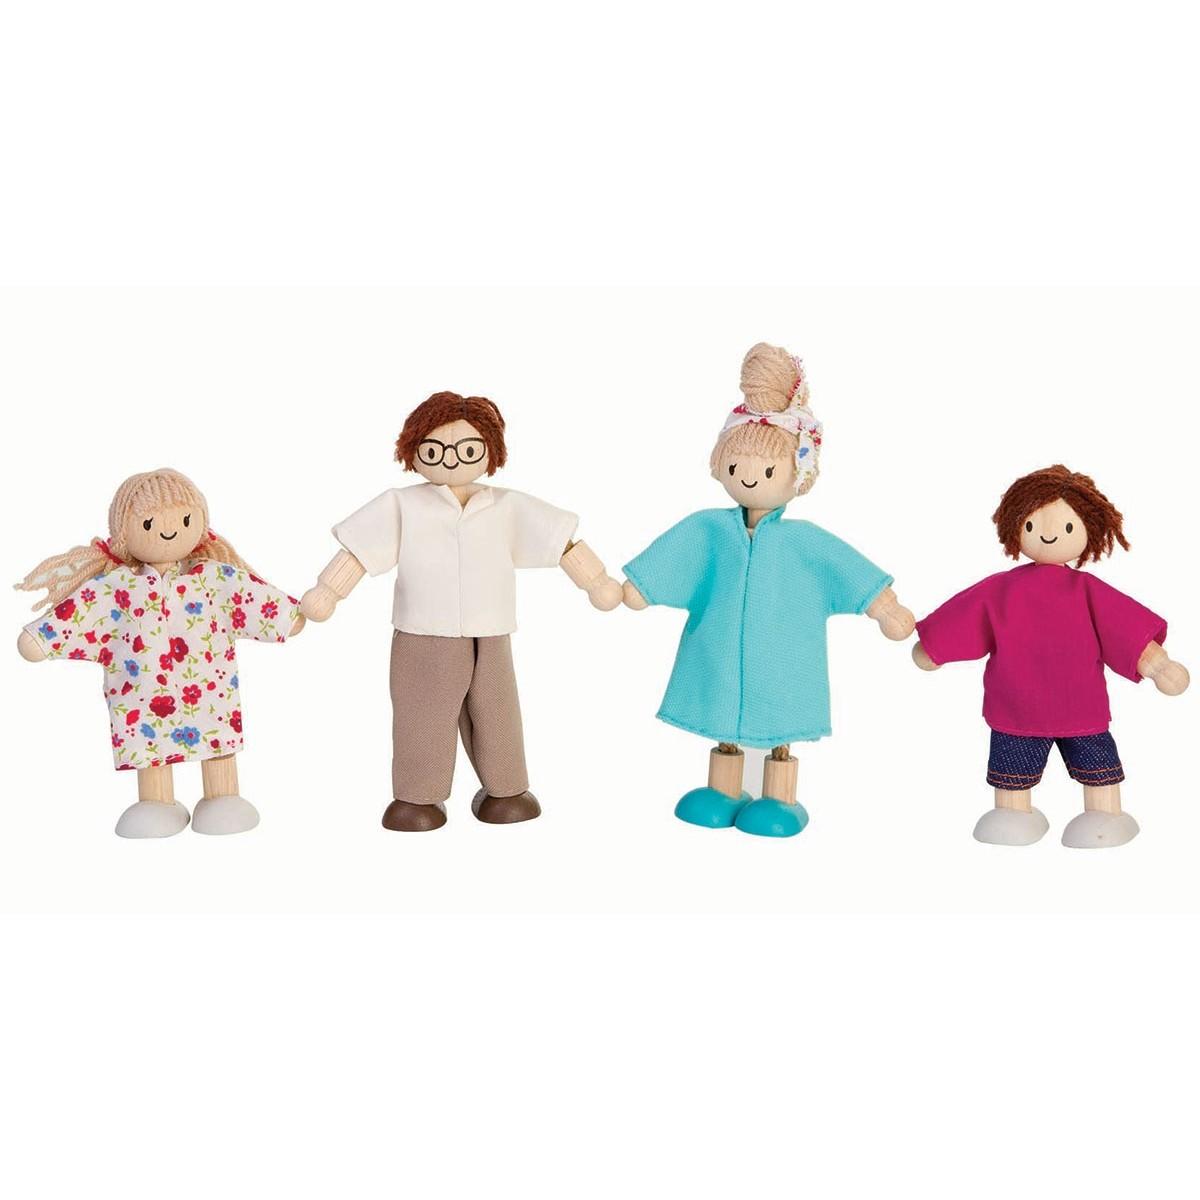 Plan Toys Modern Doll Family 7142